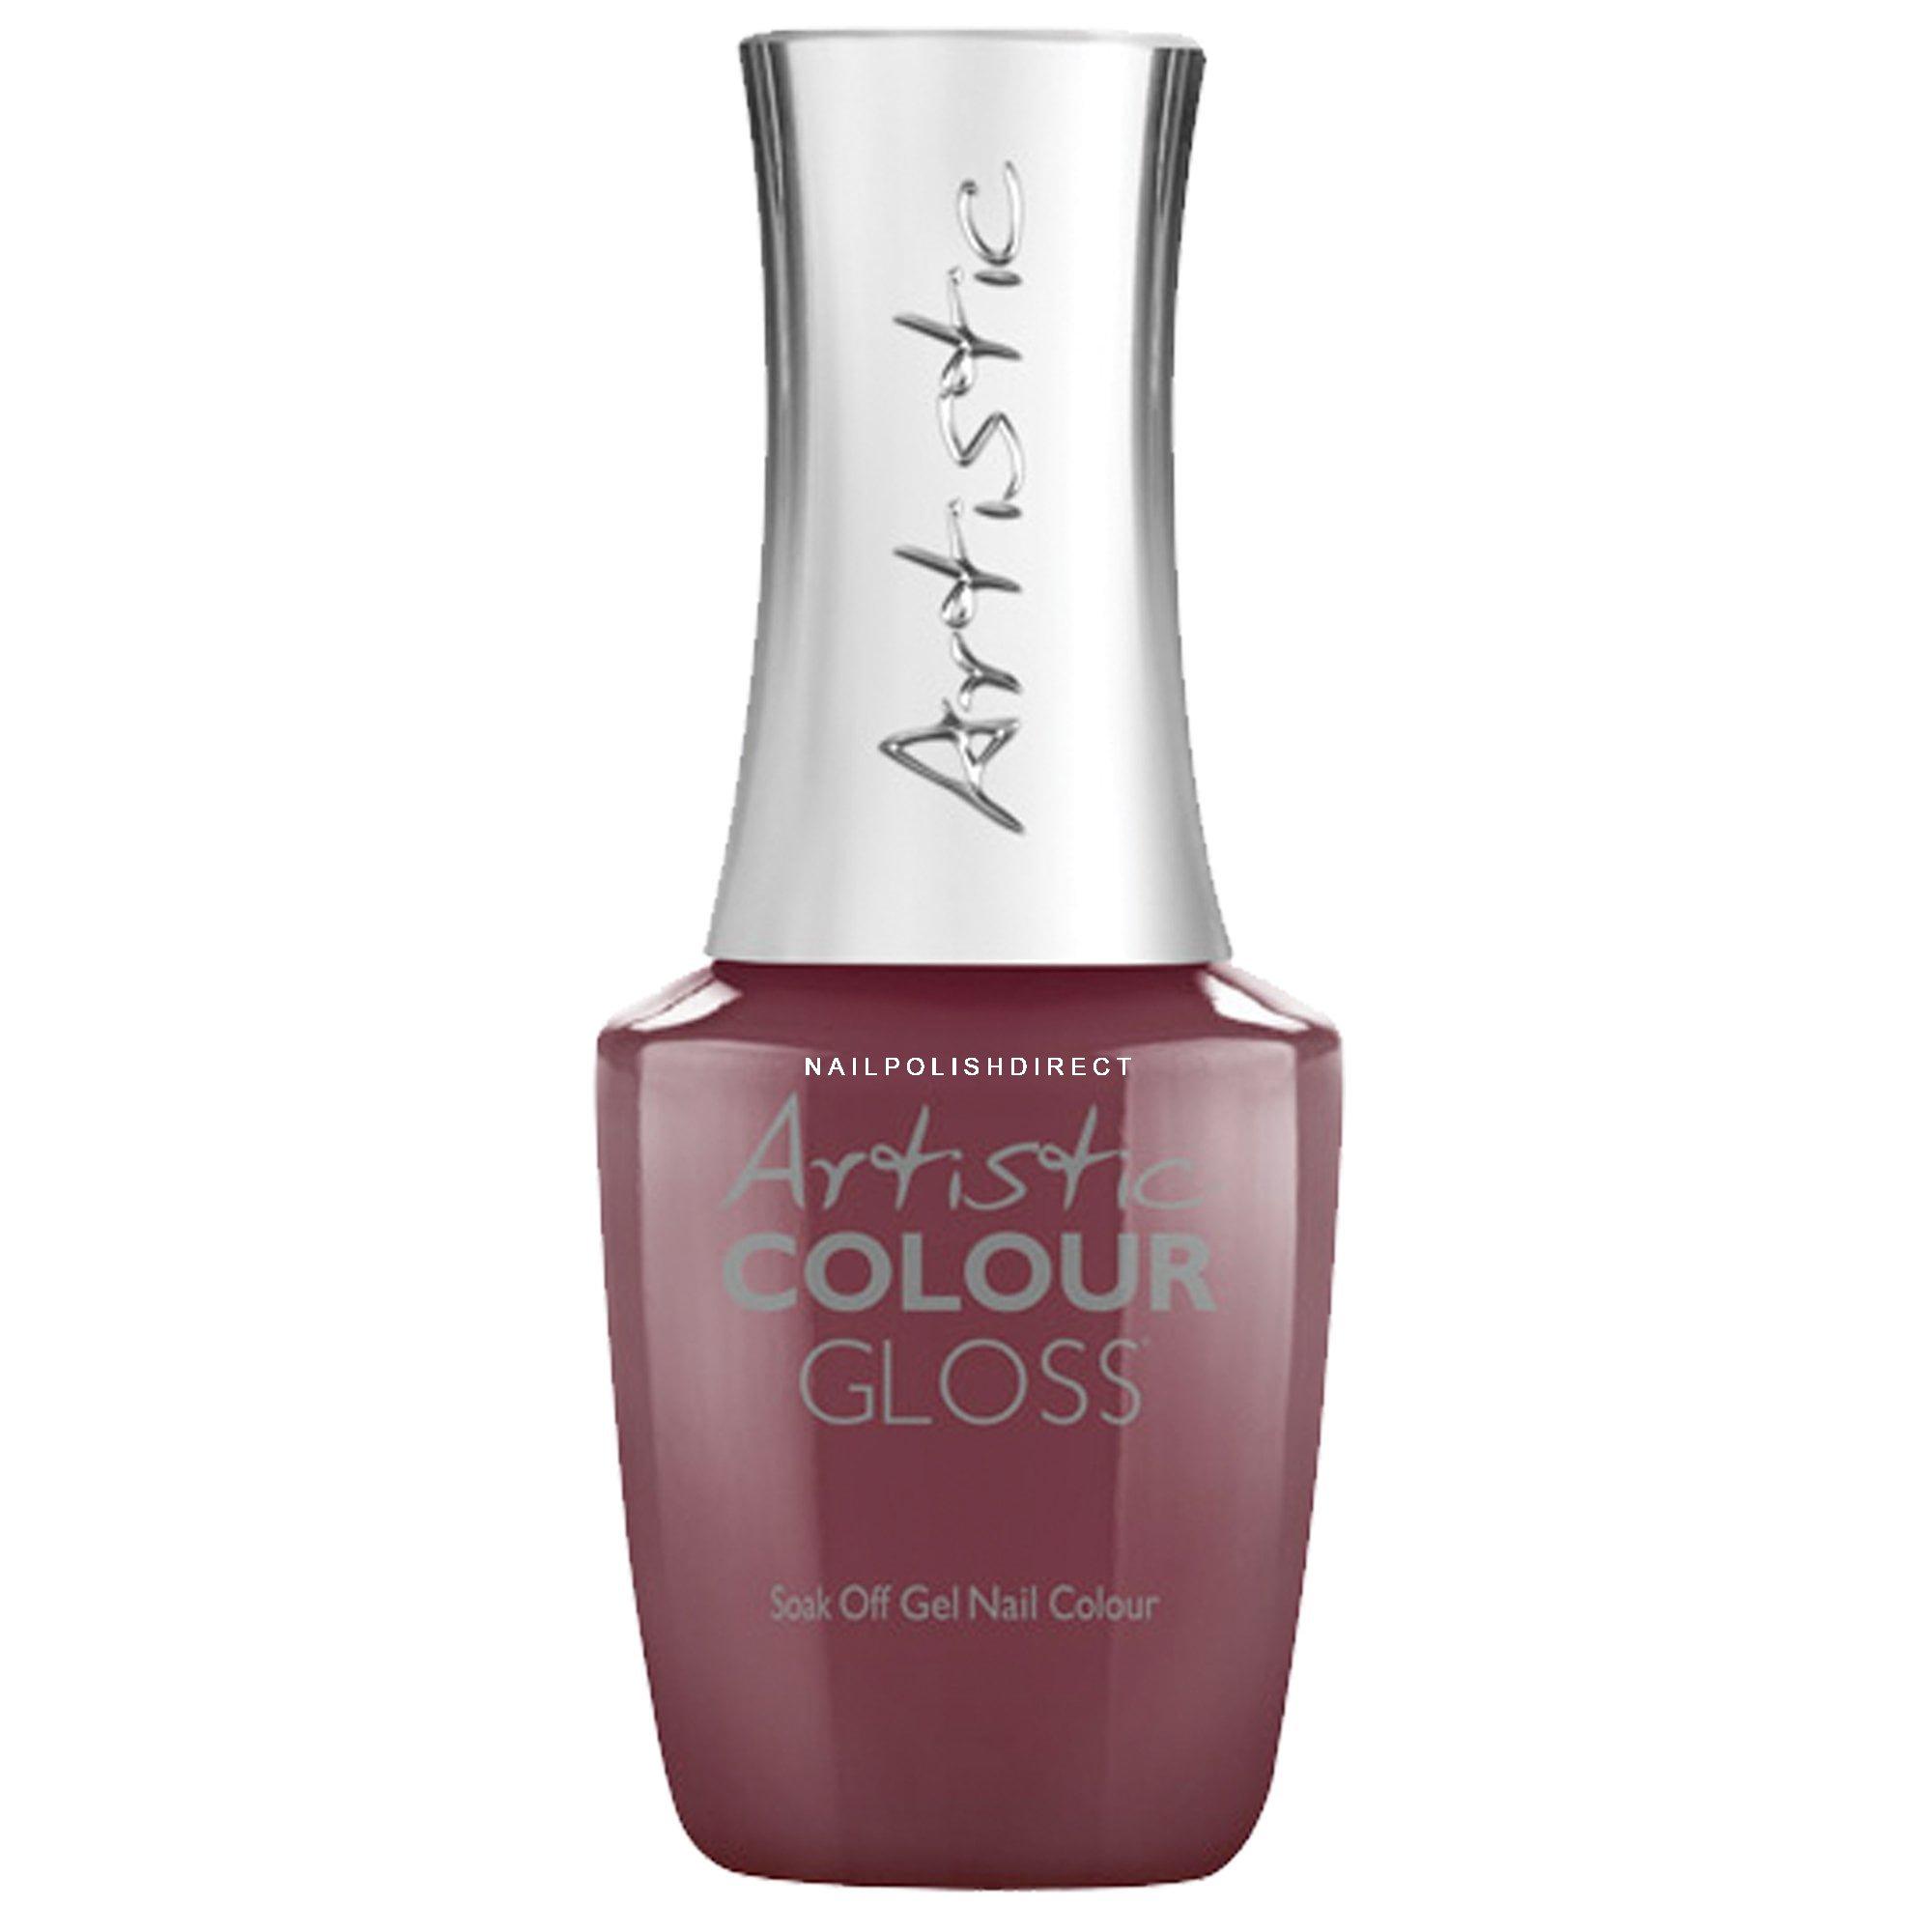 Gel Nail Polish Uk: Artistic Colour Gloss Soak Off Gel Nail Polish